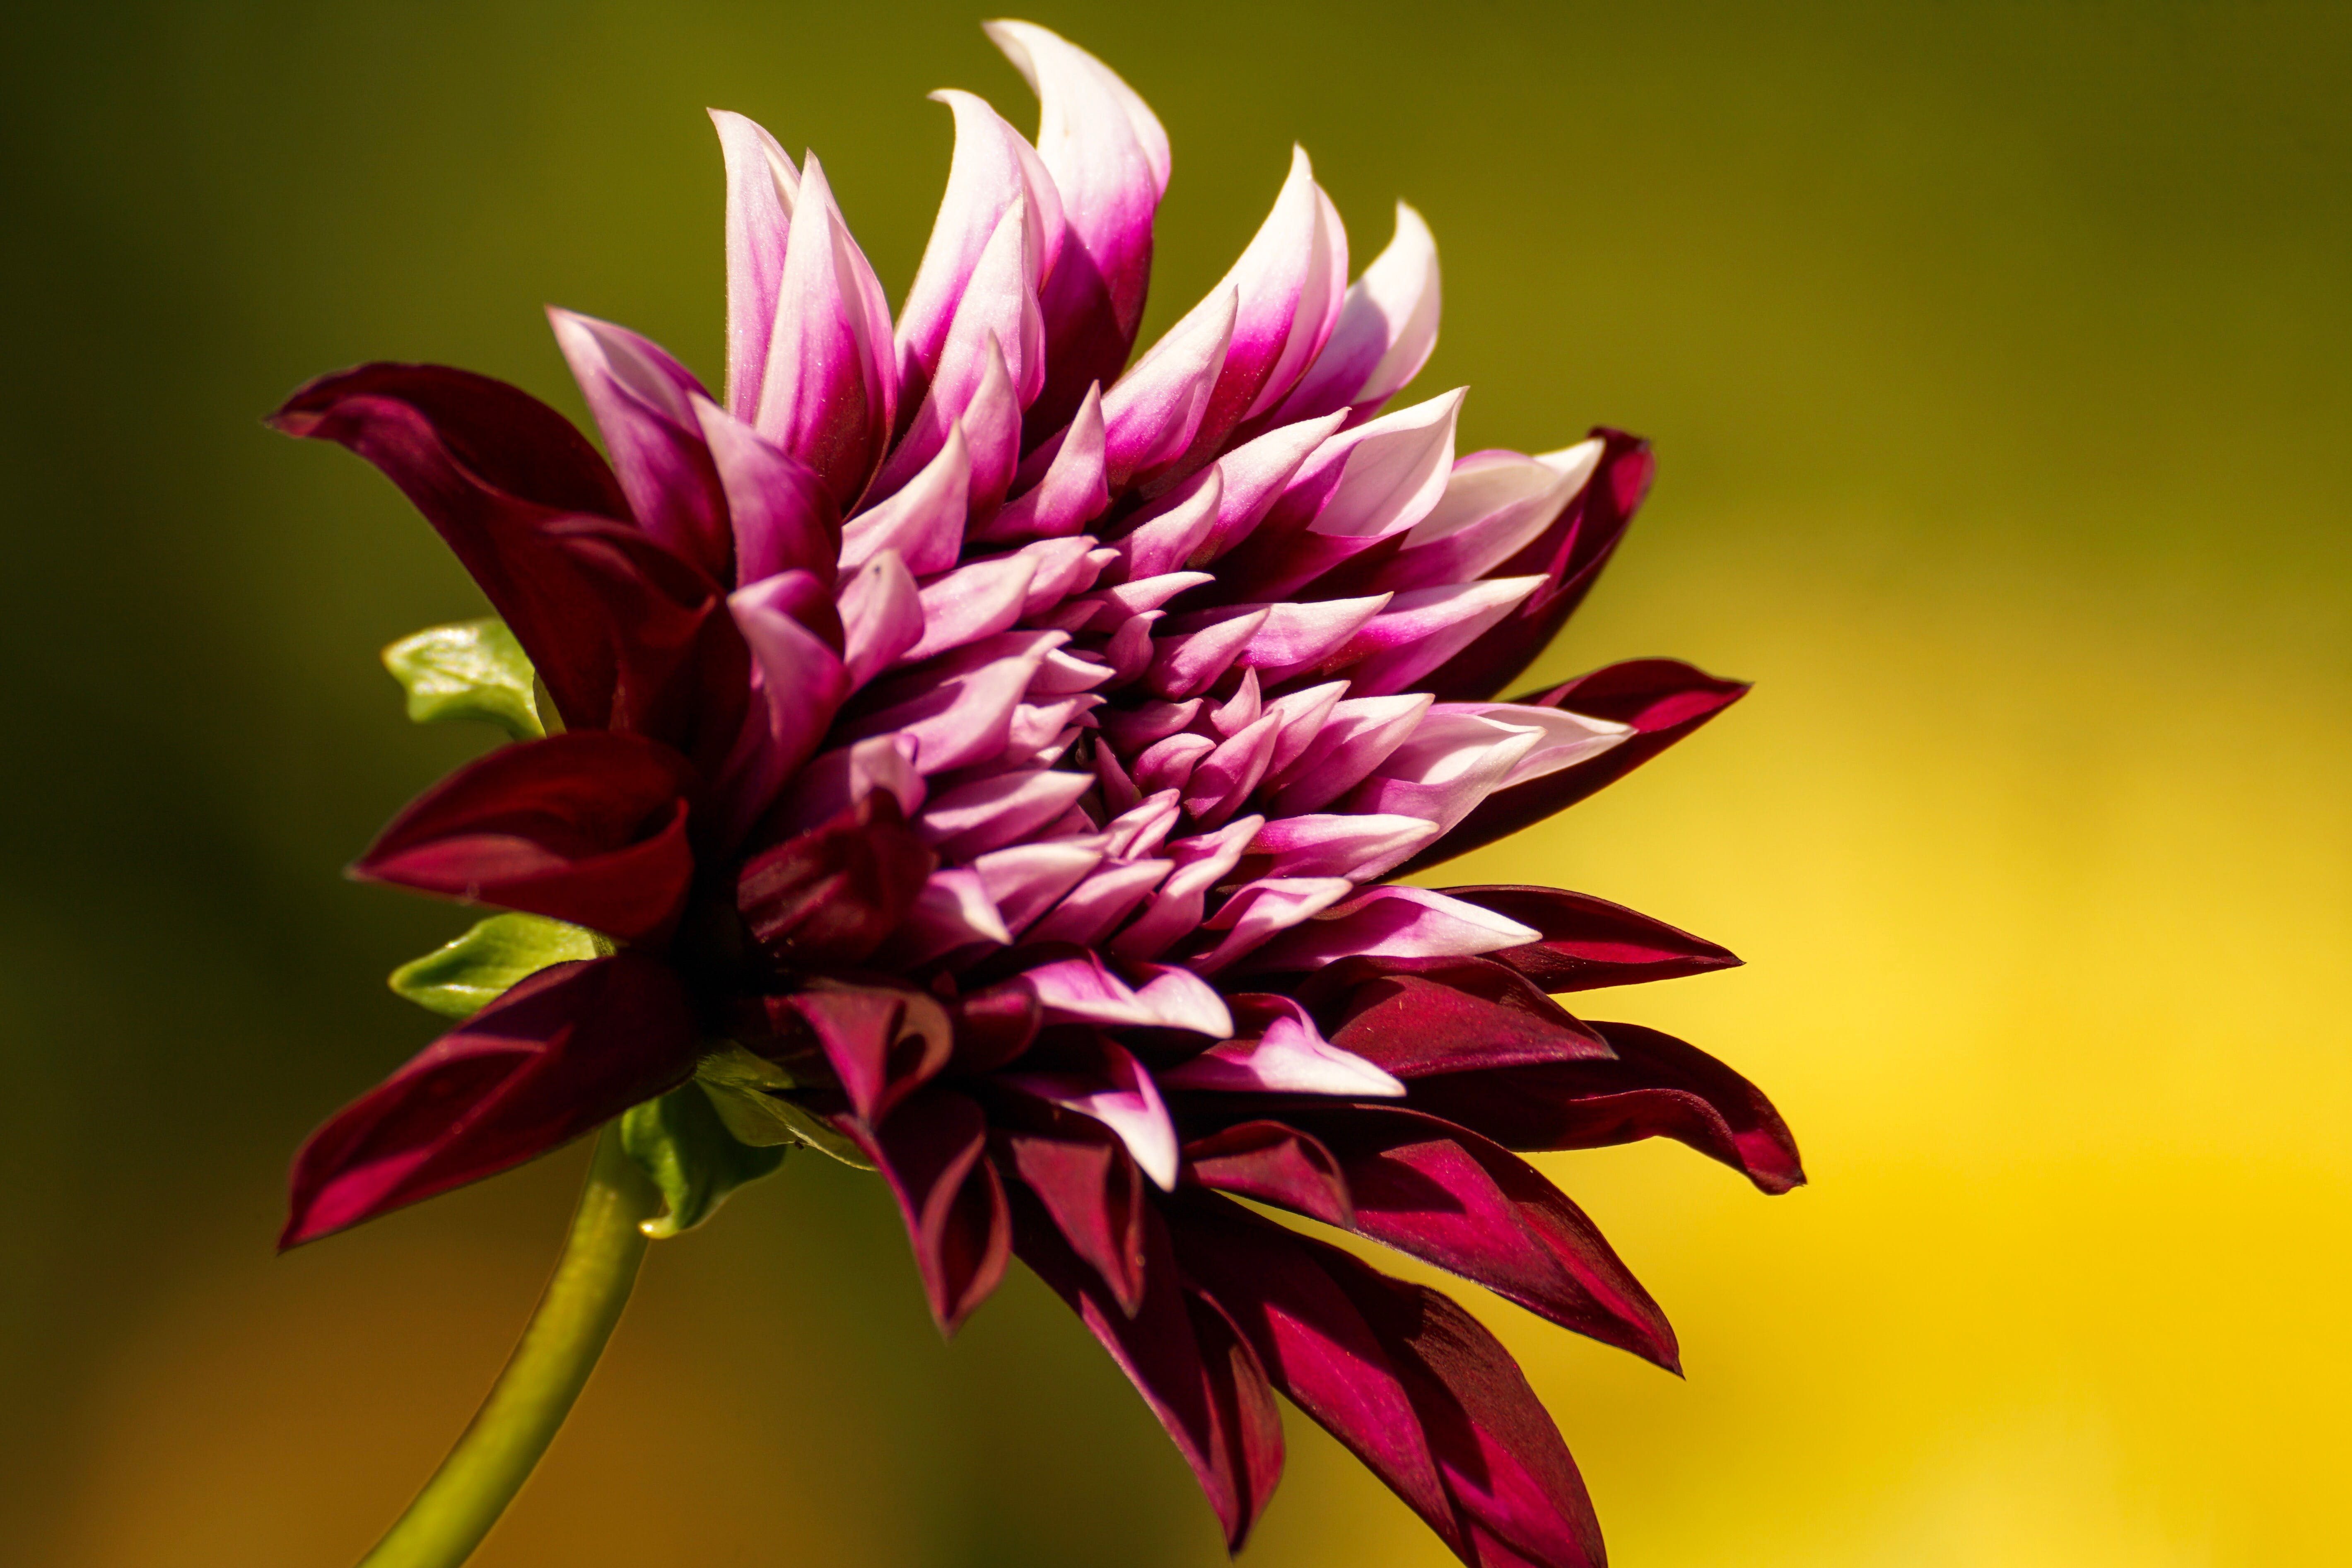 Close-up Photo of Purple Chrysanthemum